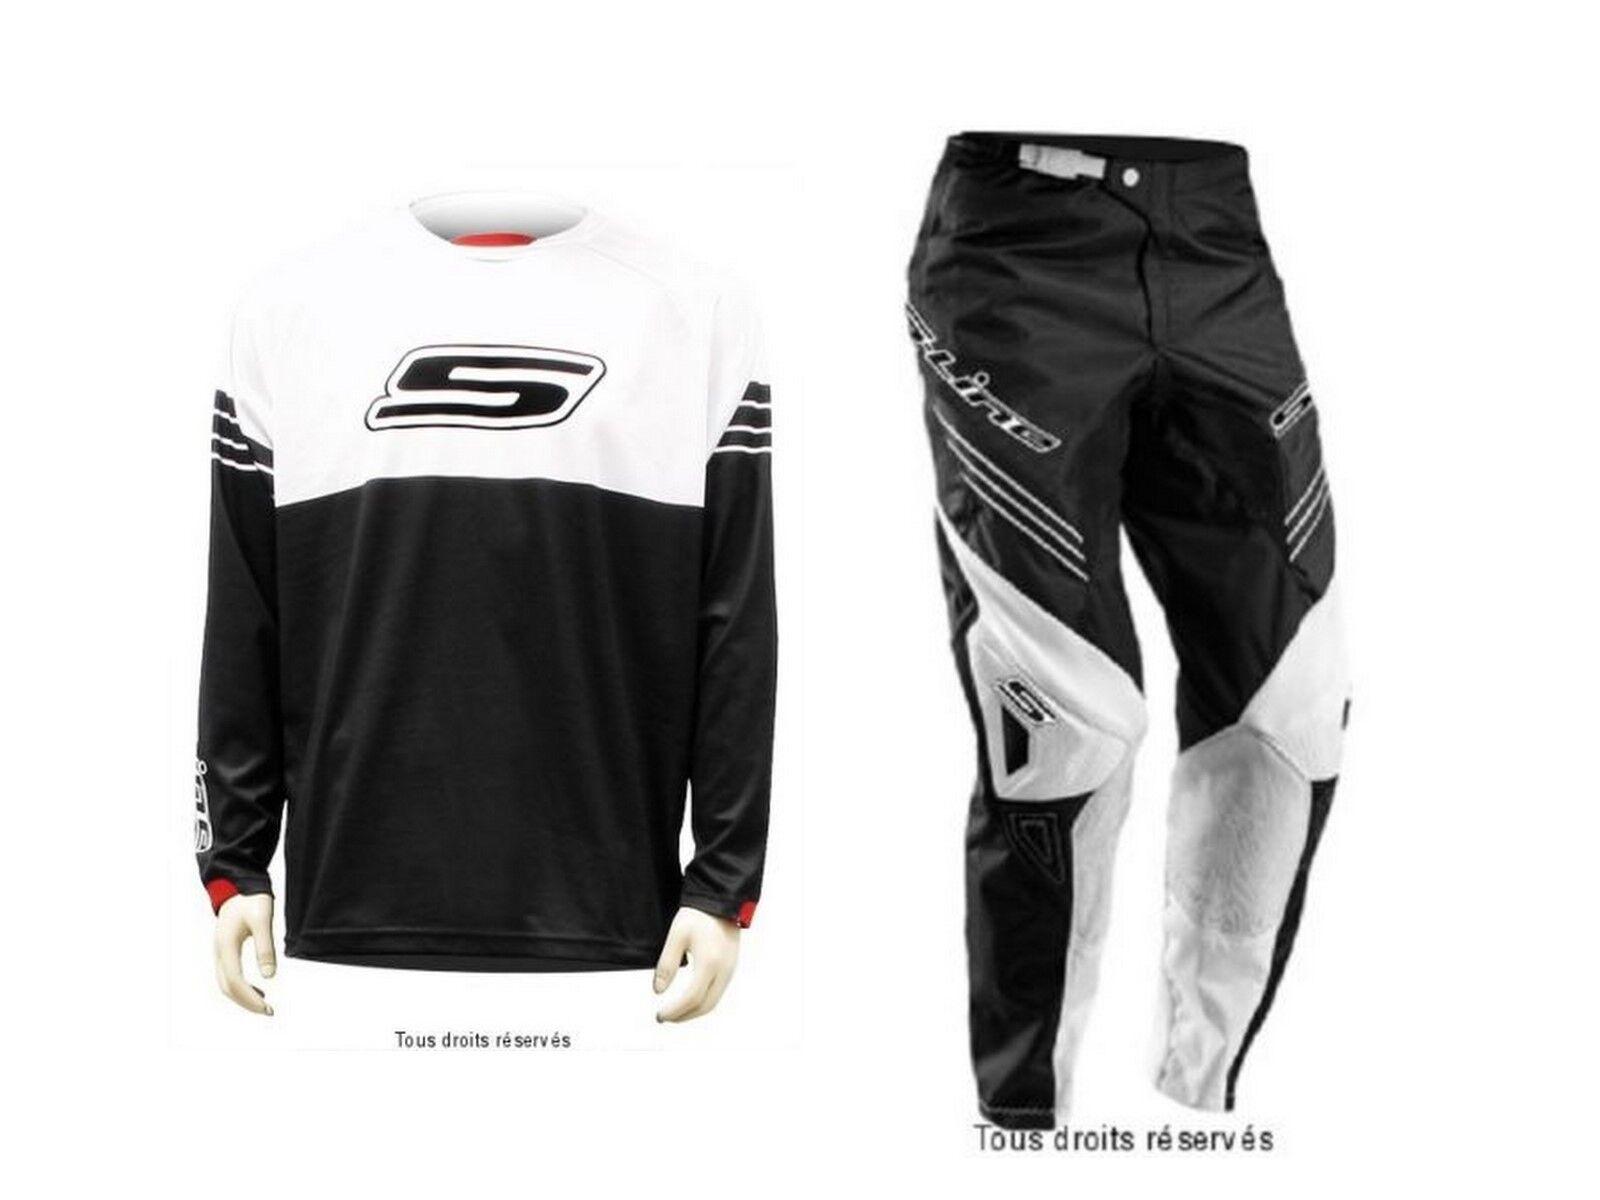 Uniforme motocross S-Line  whiteo   black pantalón FR   Camiseta XL  in stadium promotions